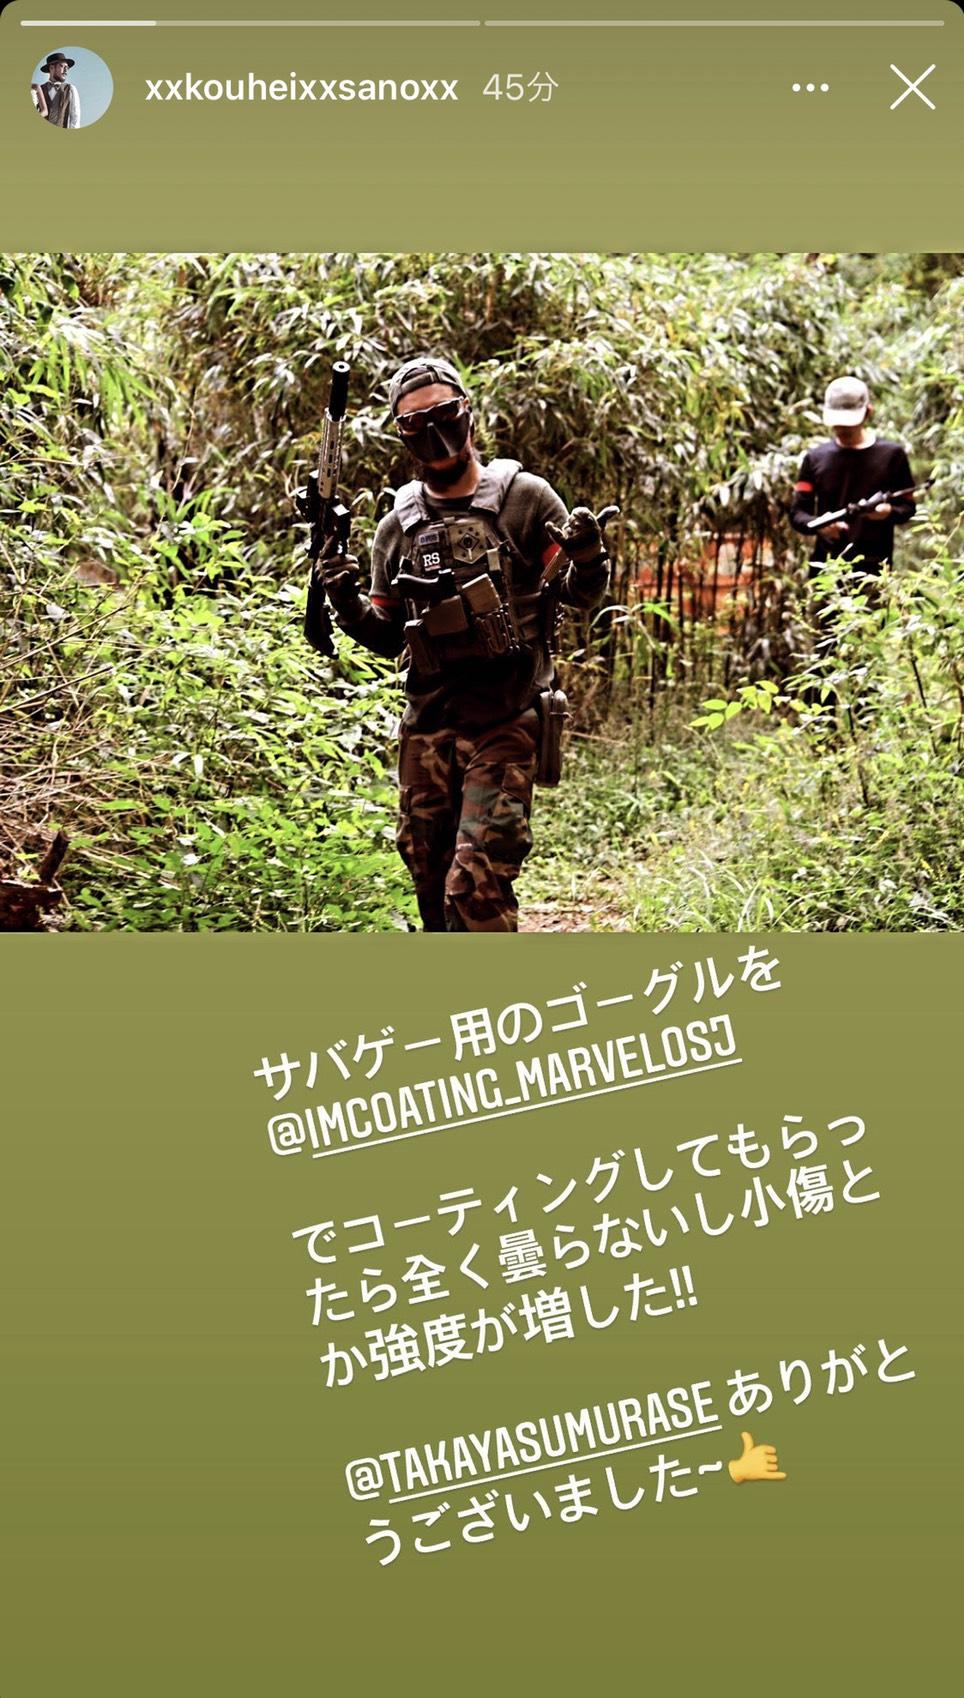 【xxkouheixxsanoxx様】サバゲー用ゴーグルのコーティング施工